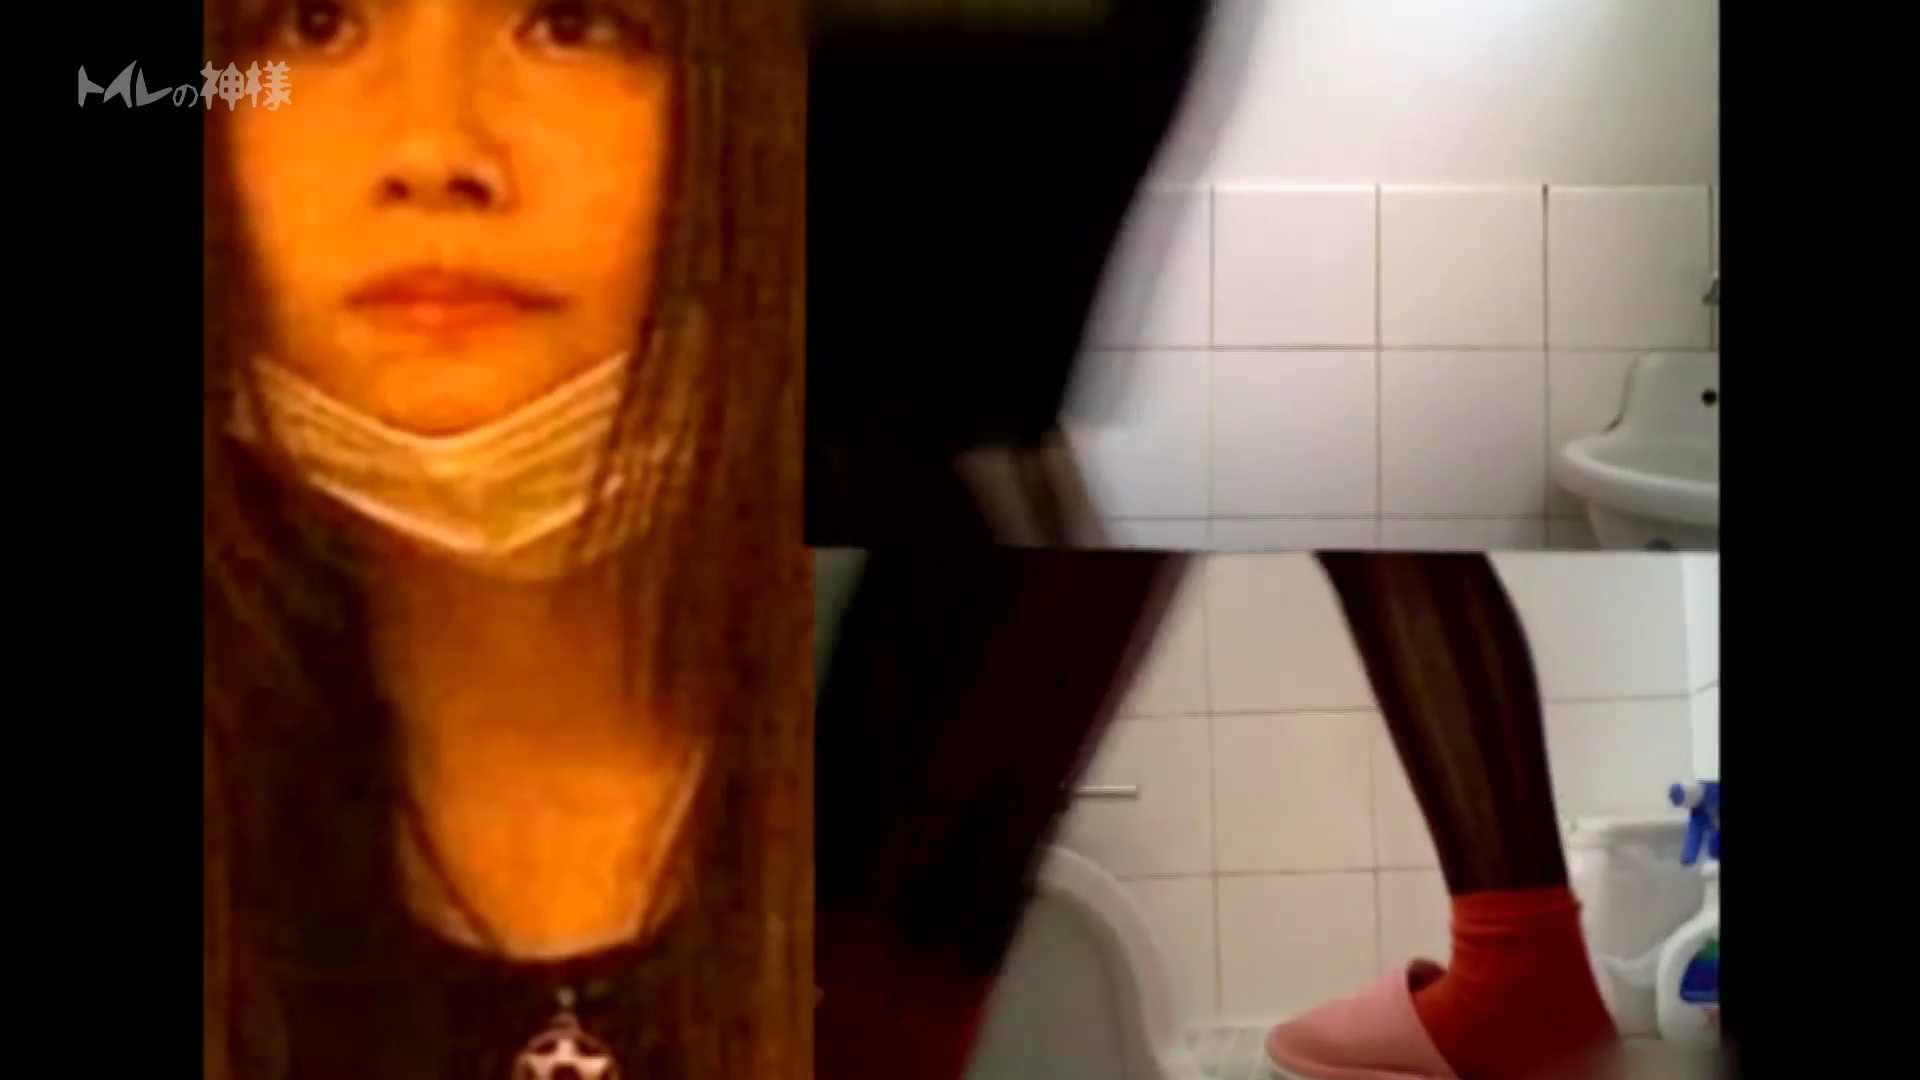 Vol.02 花の女子大生うんこ盗撮2 OL女体 ワレメ無修正動画無料 97連発 52